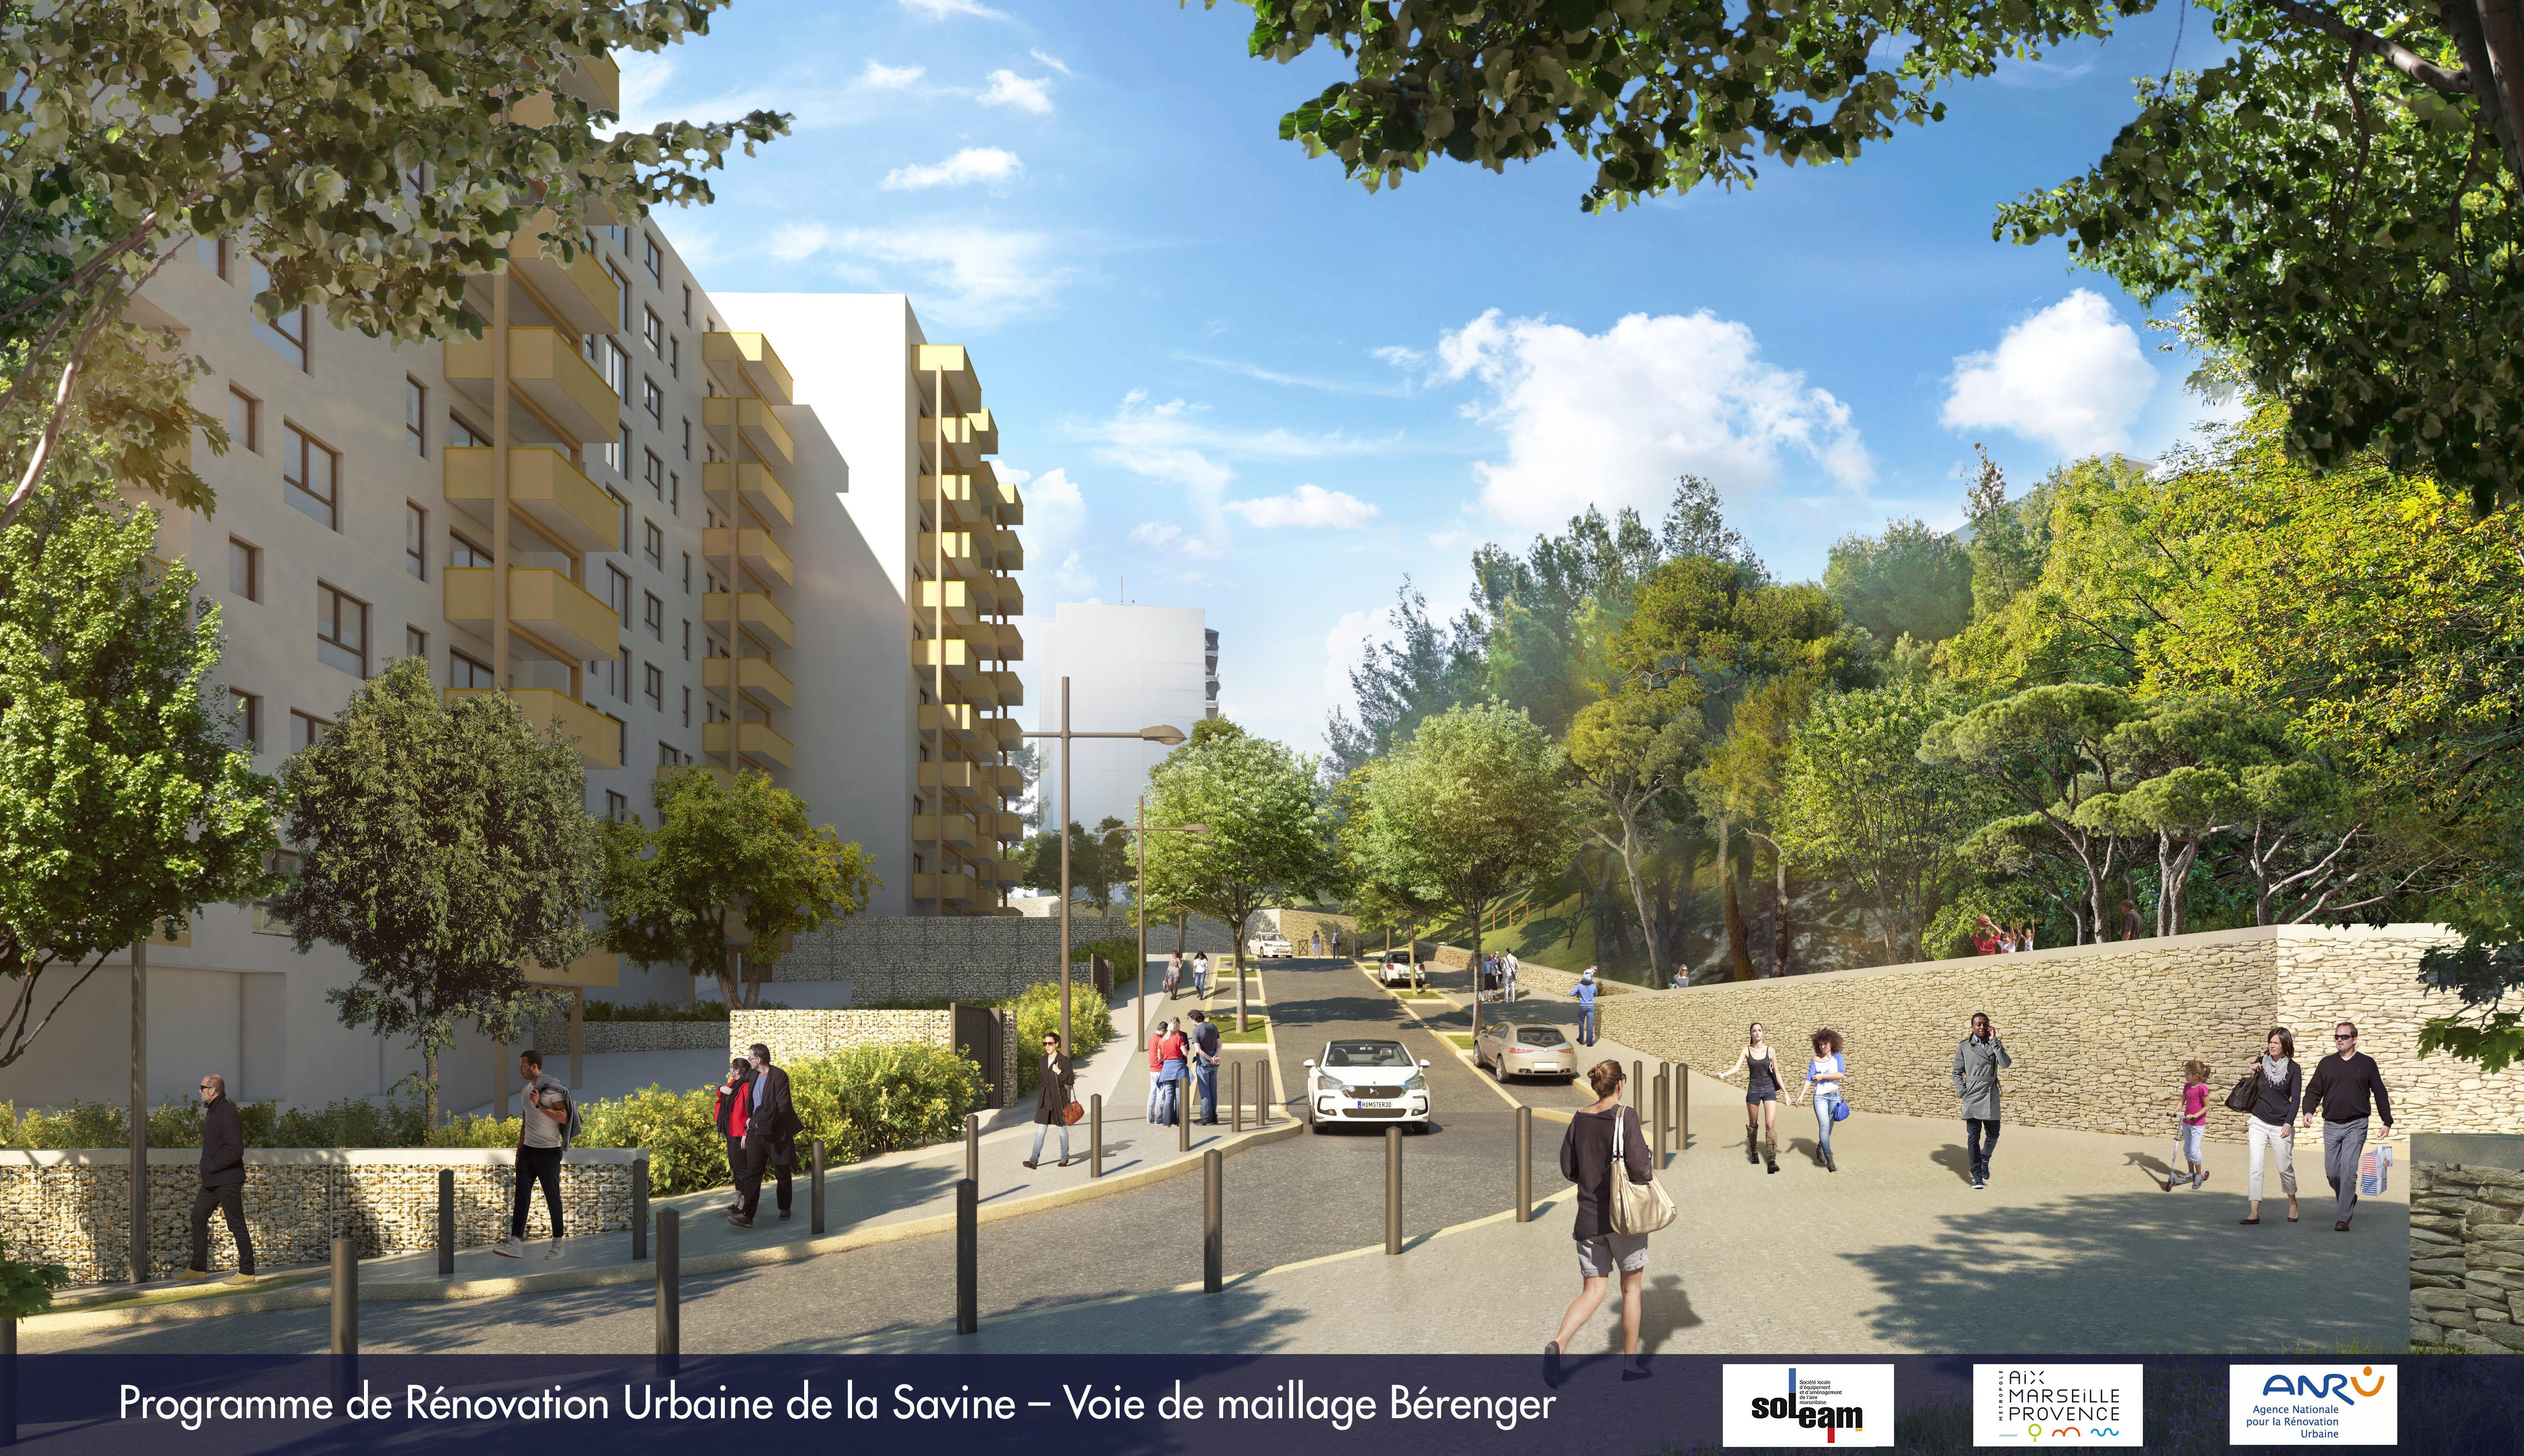 marseille rénovation urbaine organigramme